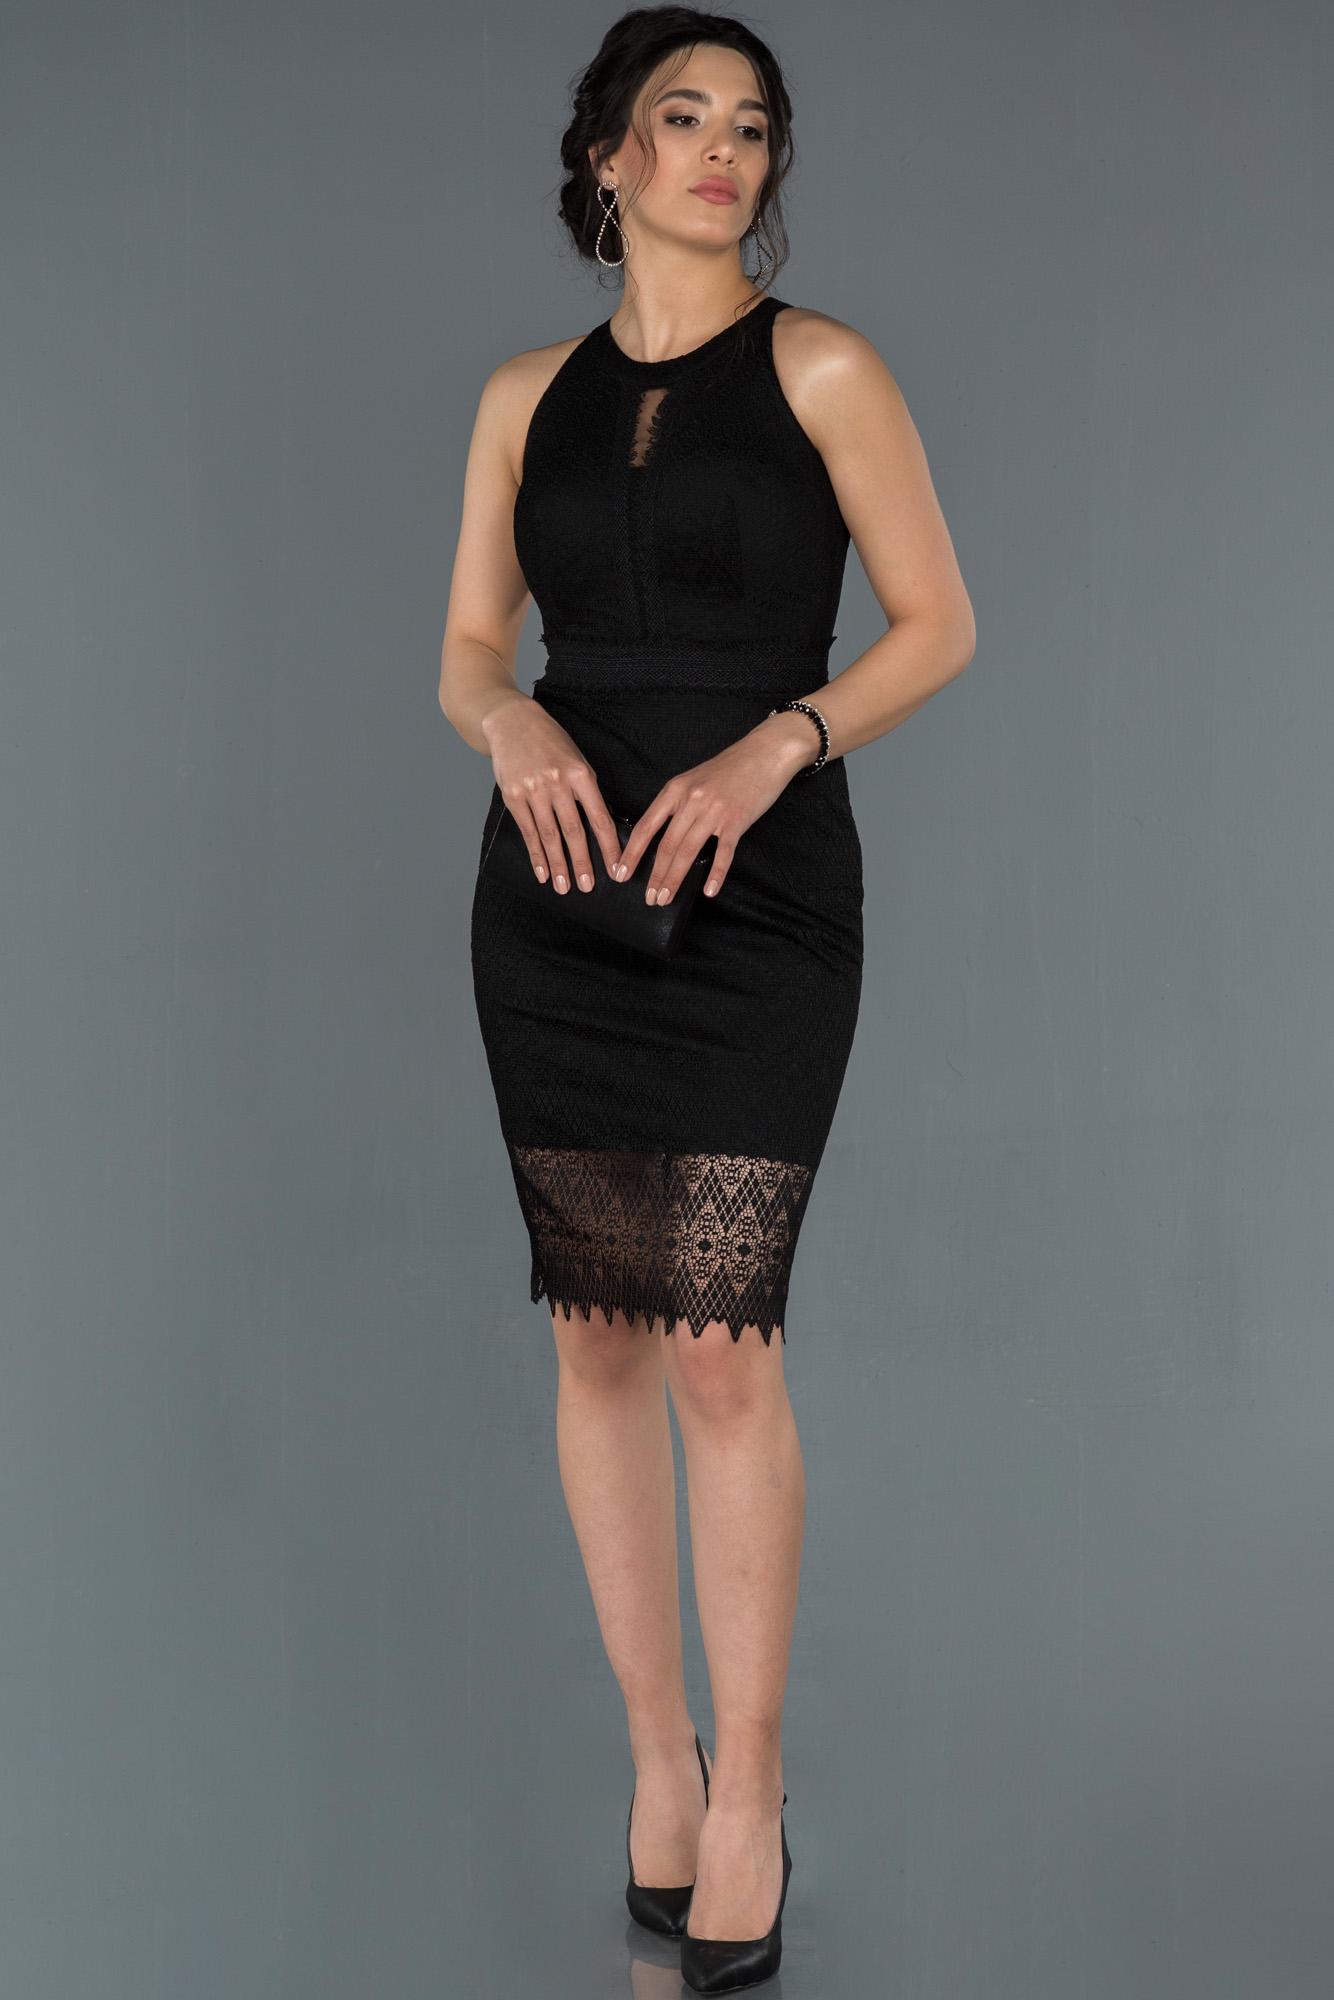 Siyah Kısa Dantelli Davet Elbisesi